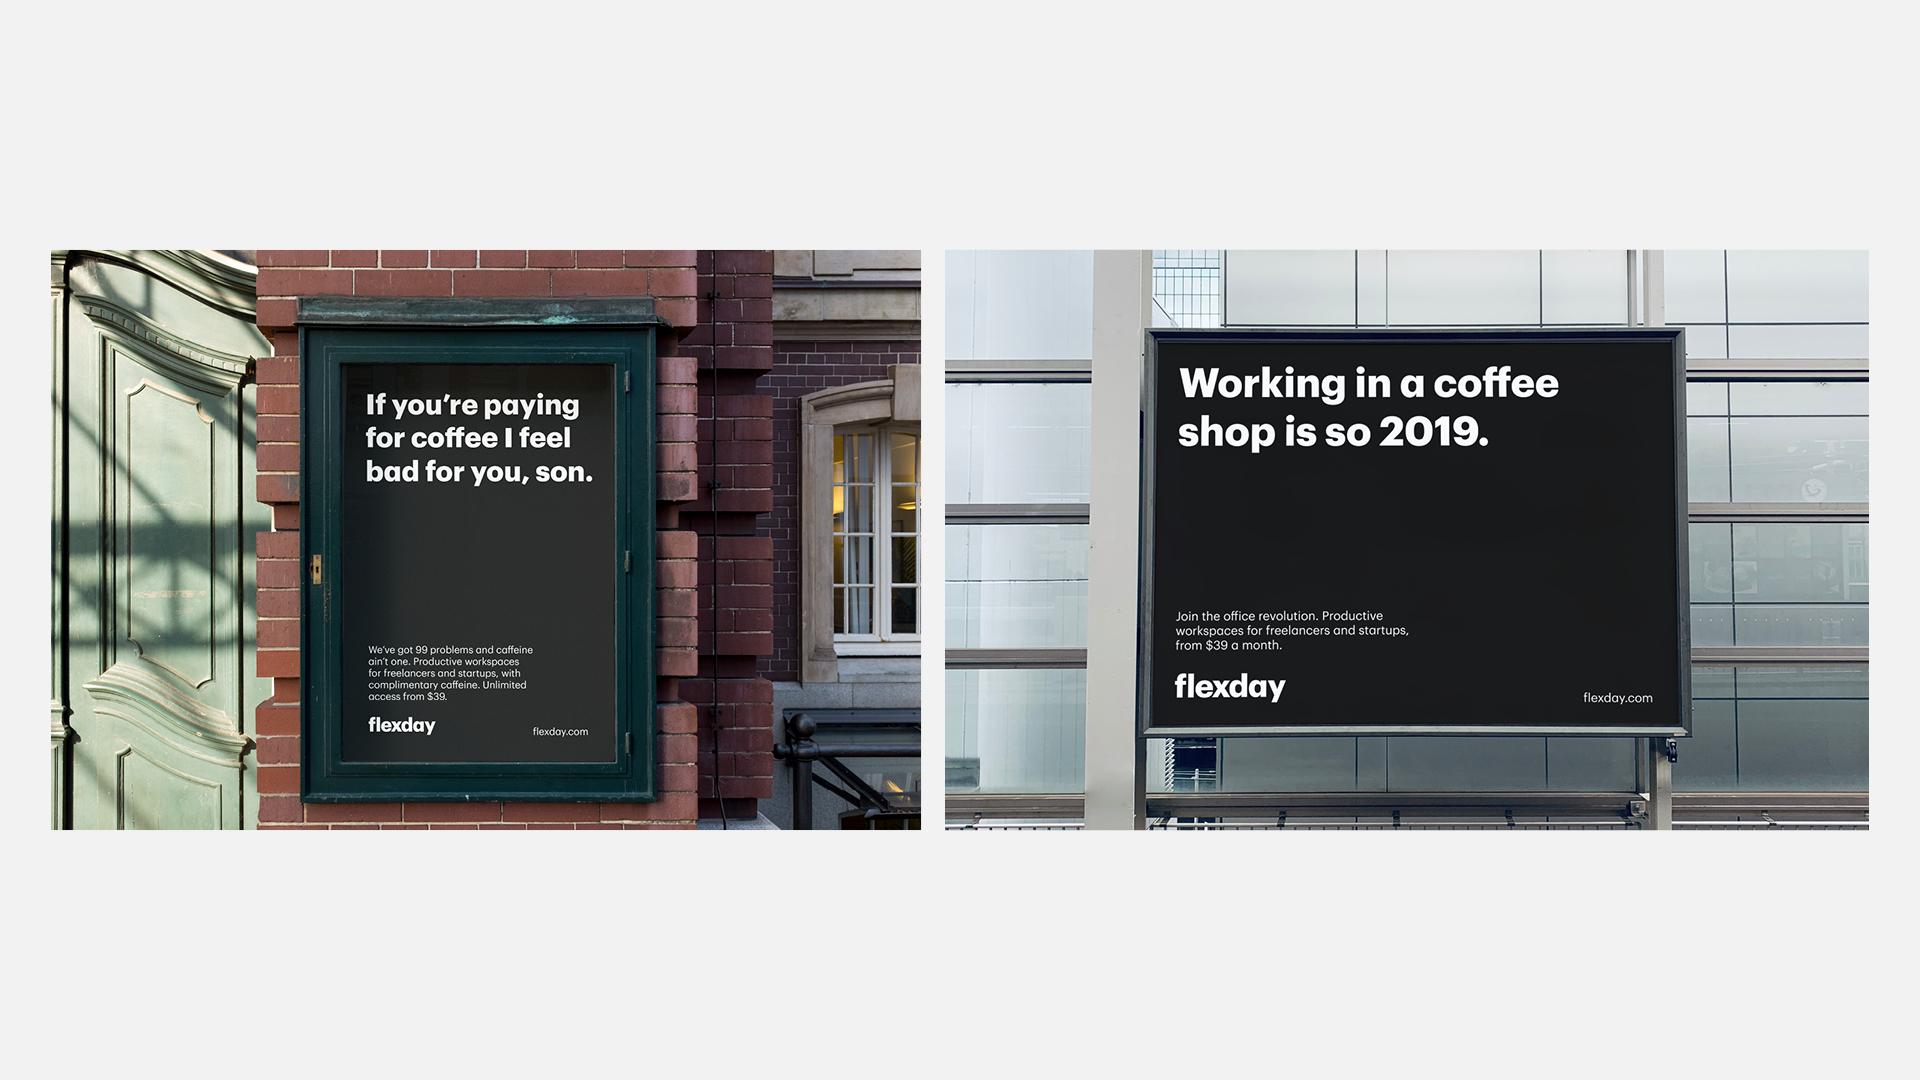 Billboard advertising for flexday